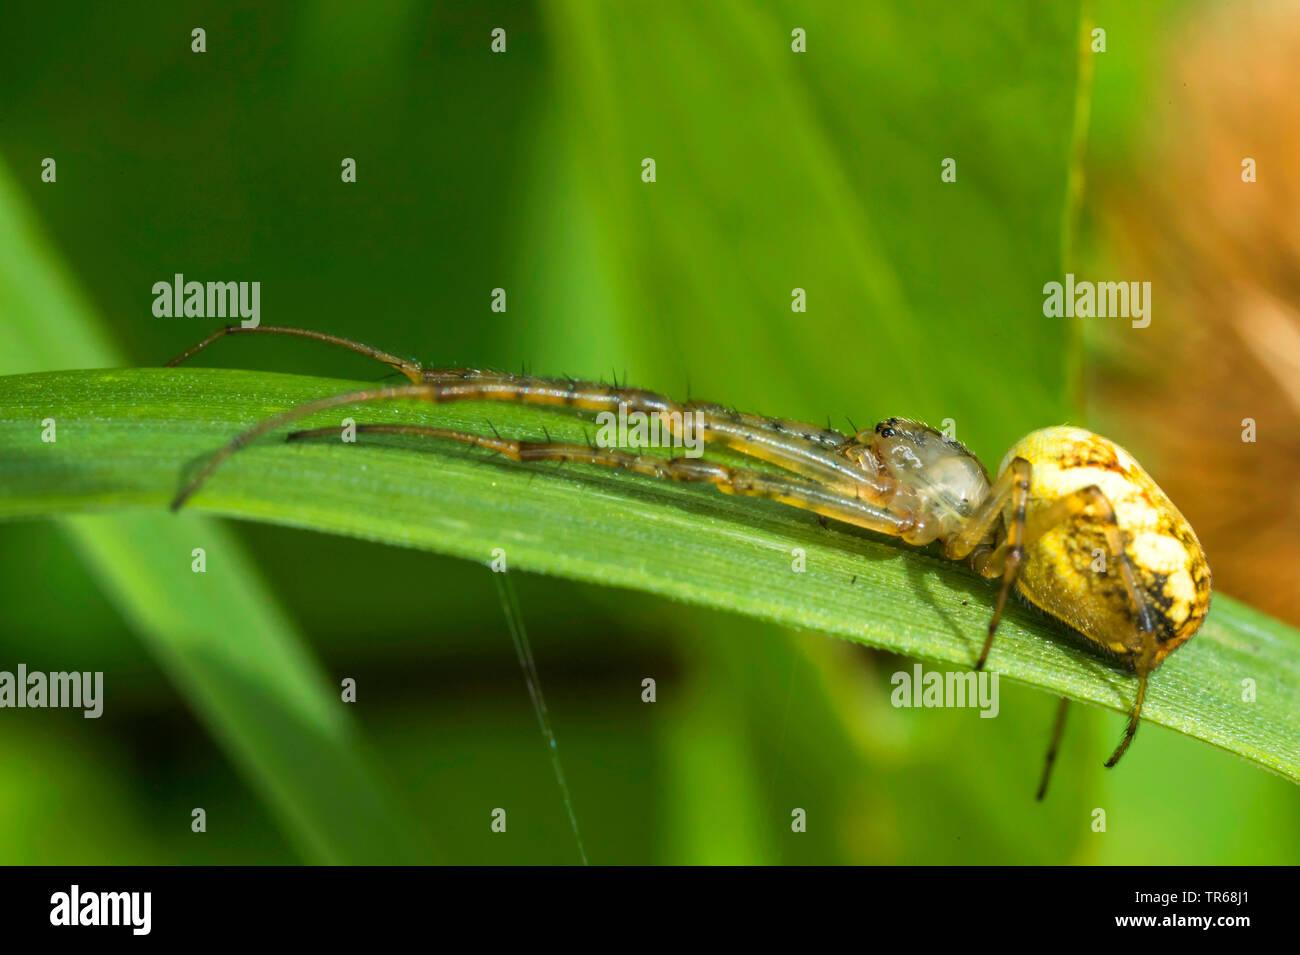 Baldachinspinne, Baldachin-Spinne, Frontinellina frutetorum (Frontinellina frutetorum, Frontinella frutetorum, Linyphia frutetorum), lauert auf einem Stock Photo